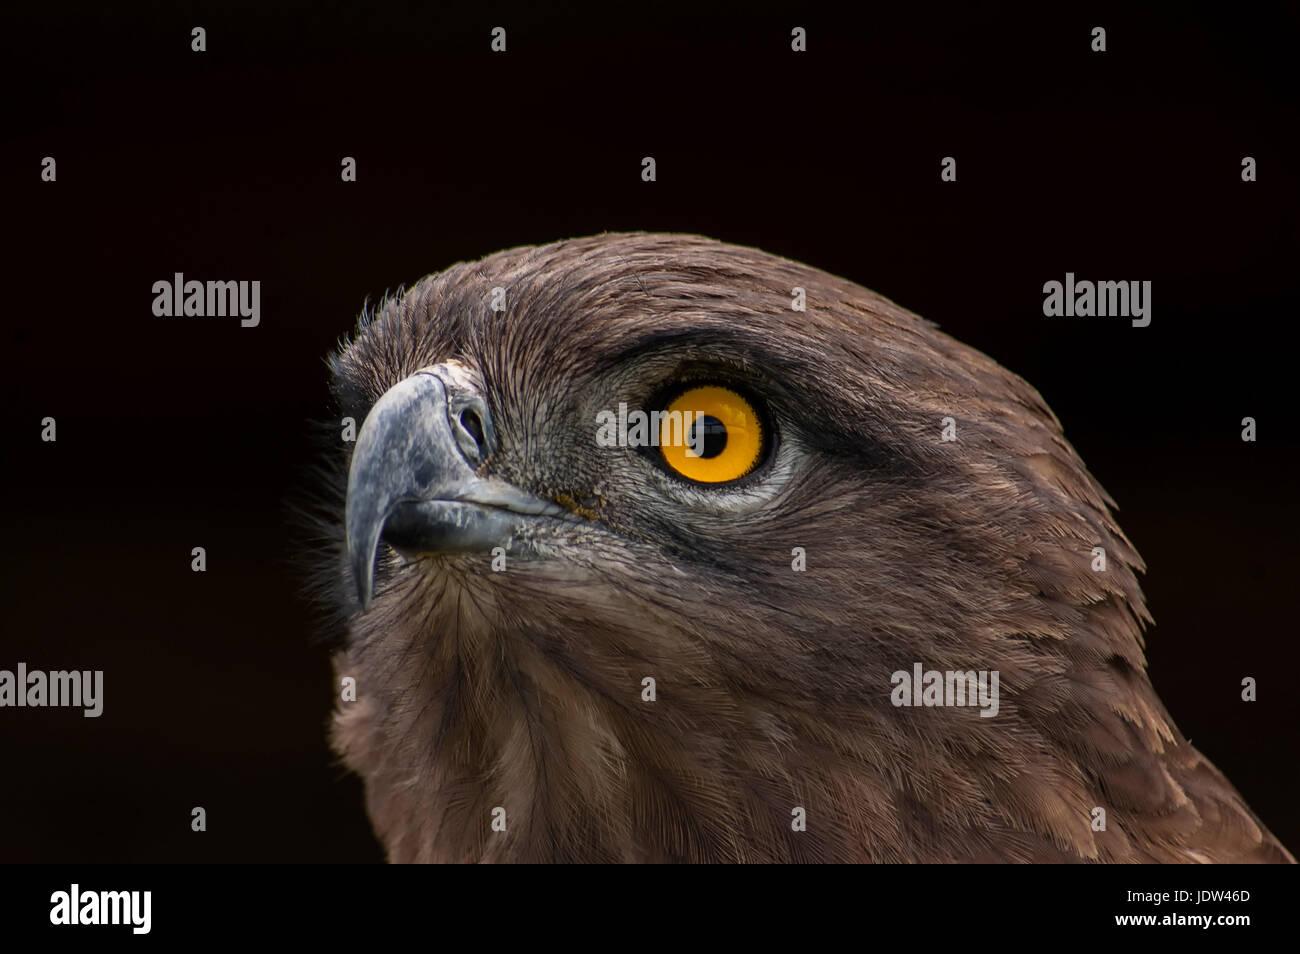 Brown Snake Eagle, Pietermaritzburg, South Africa - Stock Image